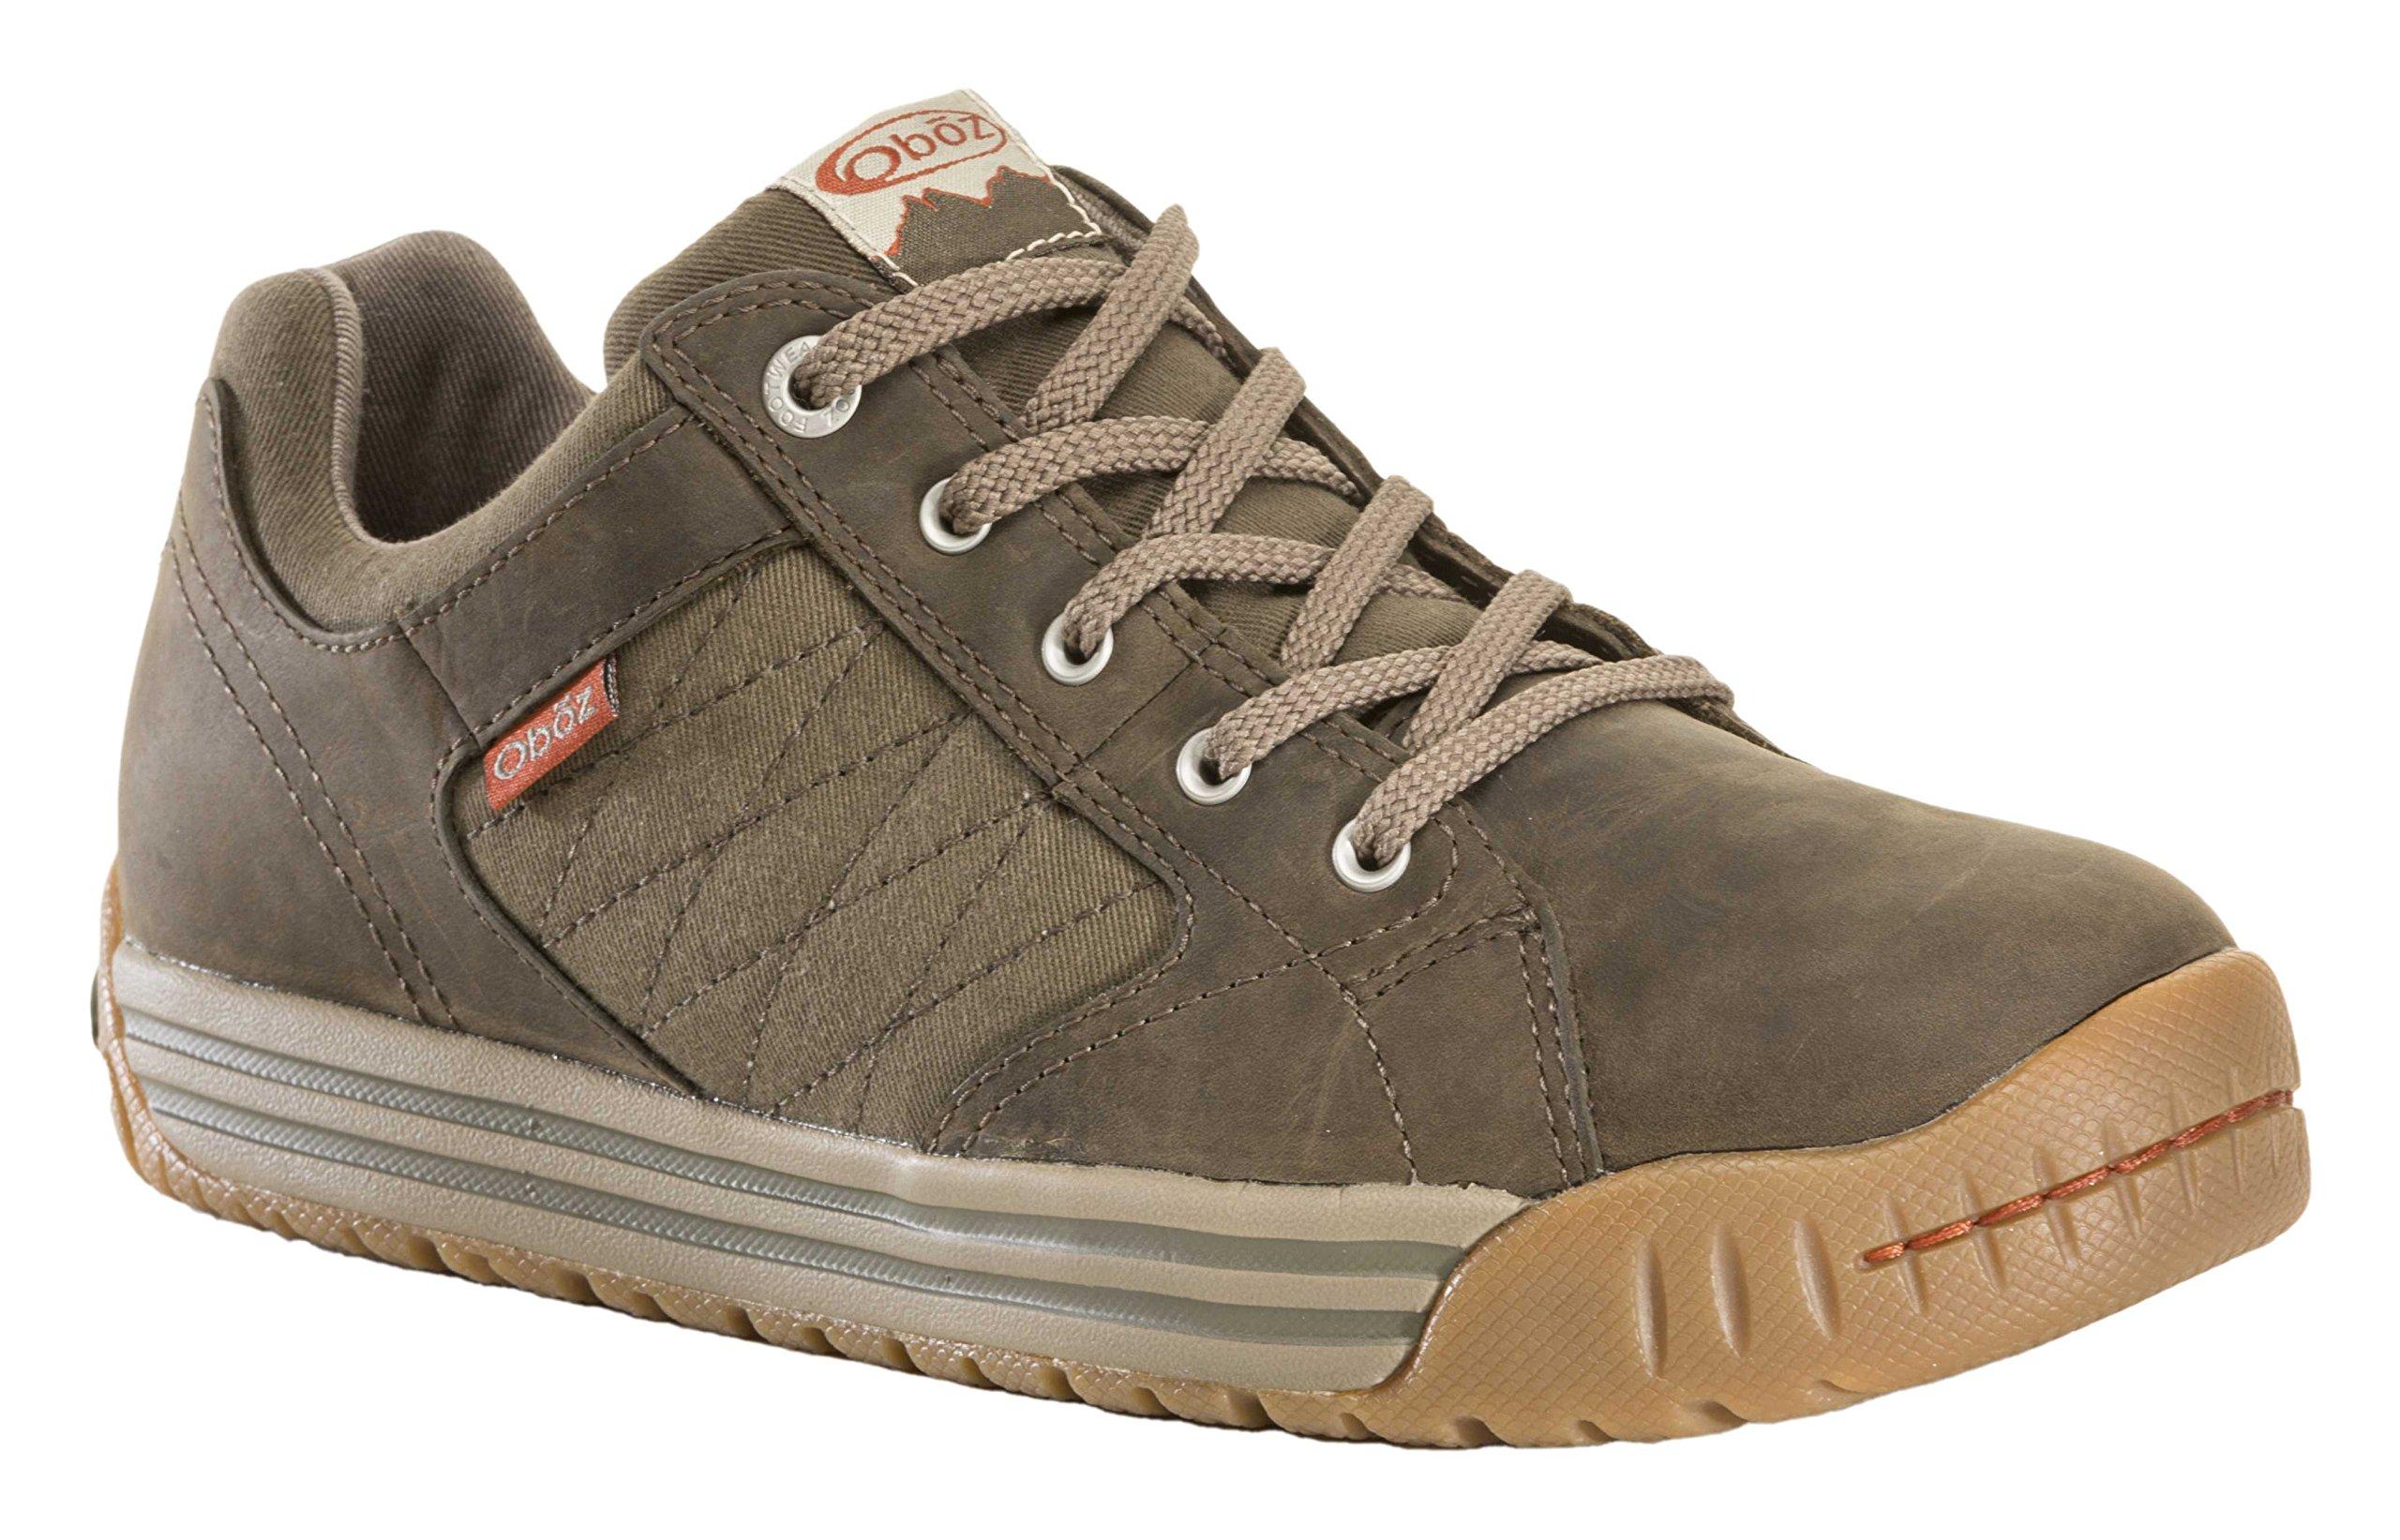 Oboz Men's Mendenhall Low Lifestyle Shoe,Tarmac,10 D US